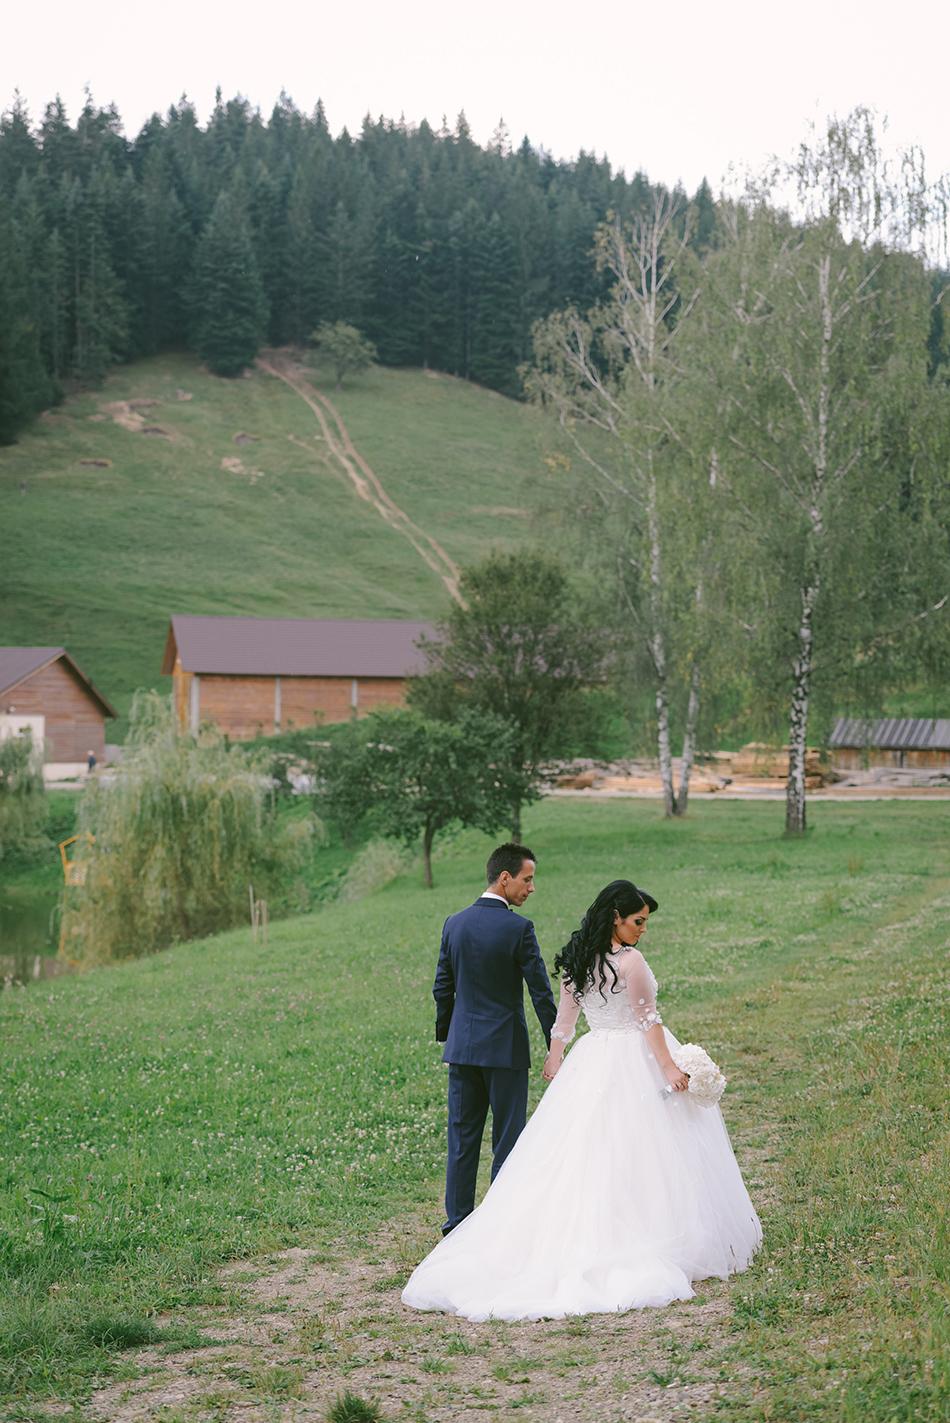 AD Passion Photography | ad-passion_diana-si-gabi_fotograf-nunta-suceava_0070 | Adelin, Dida, fotograf profesionist, fotograf de nunta, fotografie de nunta, fotograf Timisoara, fotograf Craiova, fotograf Bucuresti, fotograf Arad, nunta Timisoara, nunta Arad, nunta Bucuresti, nunta Craiova